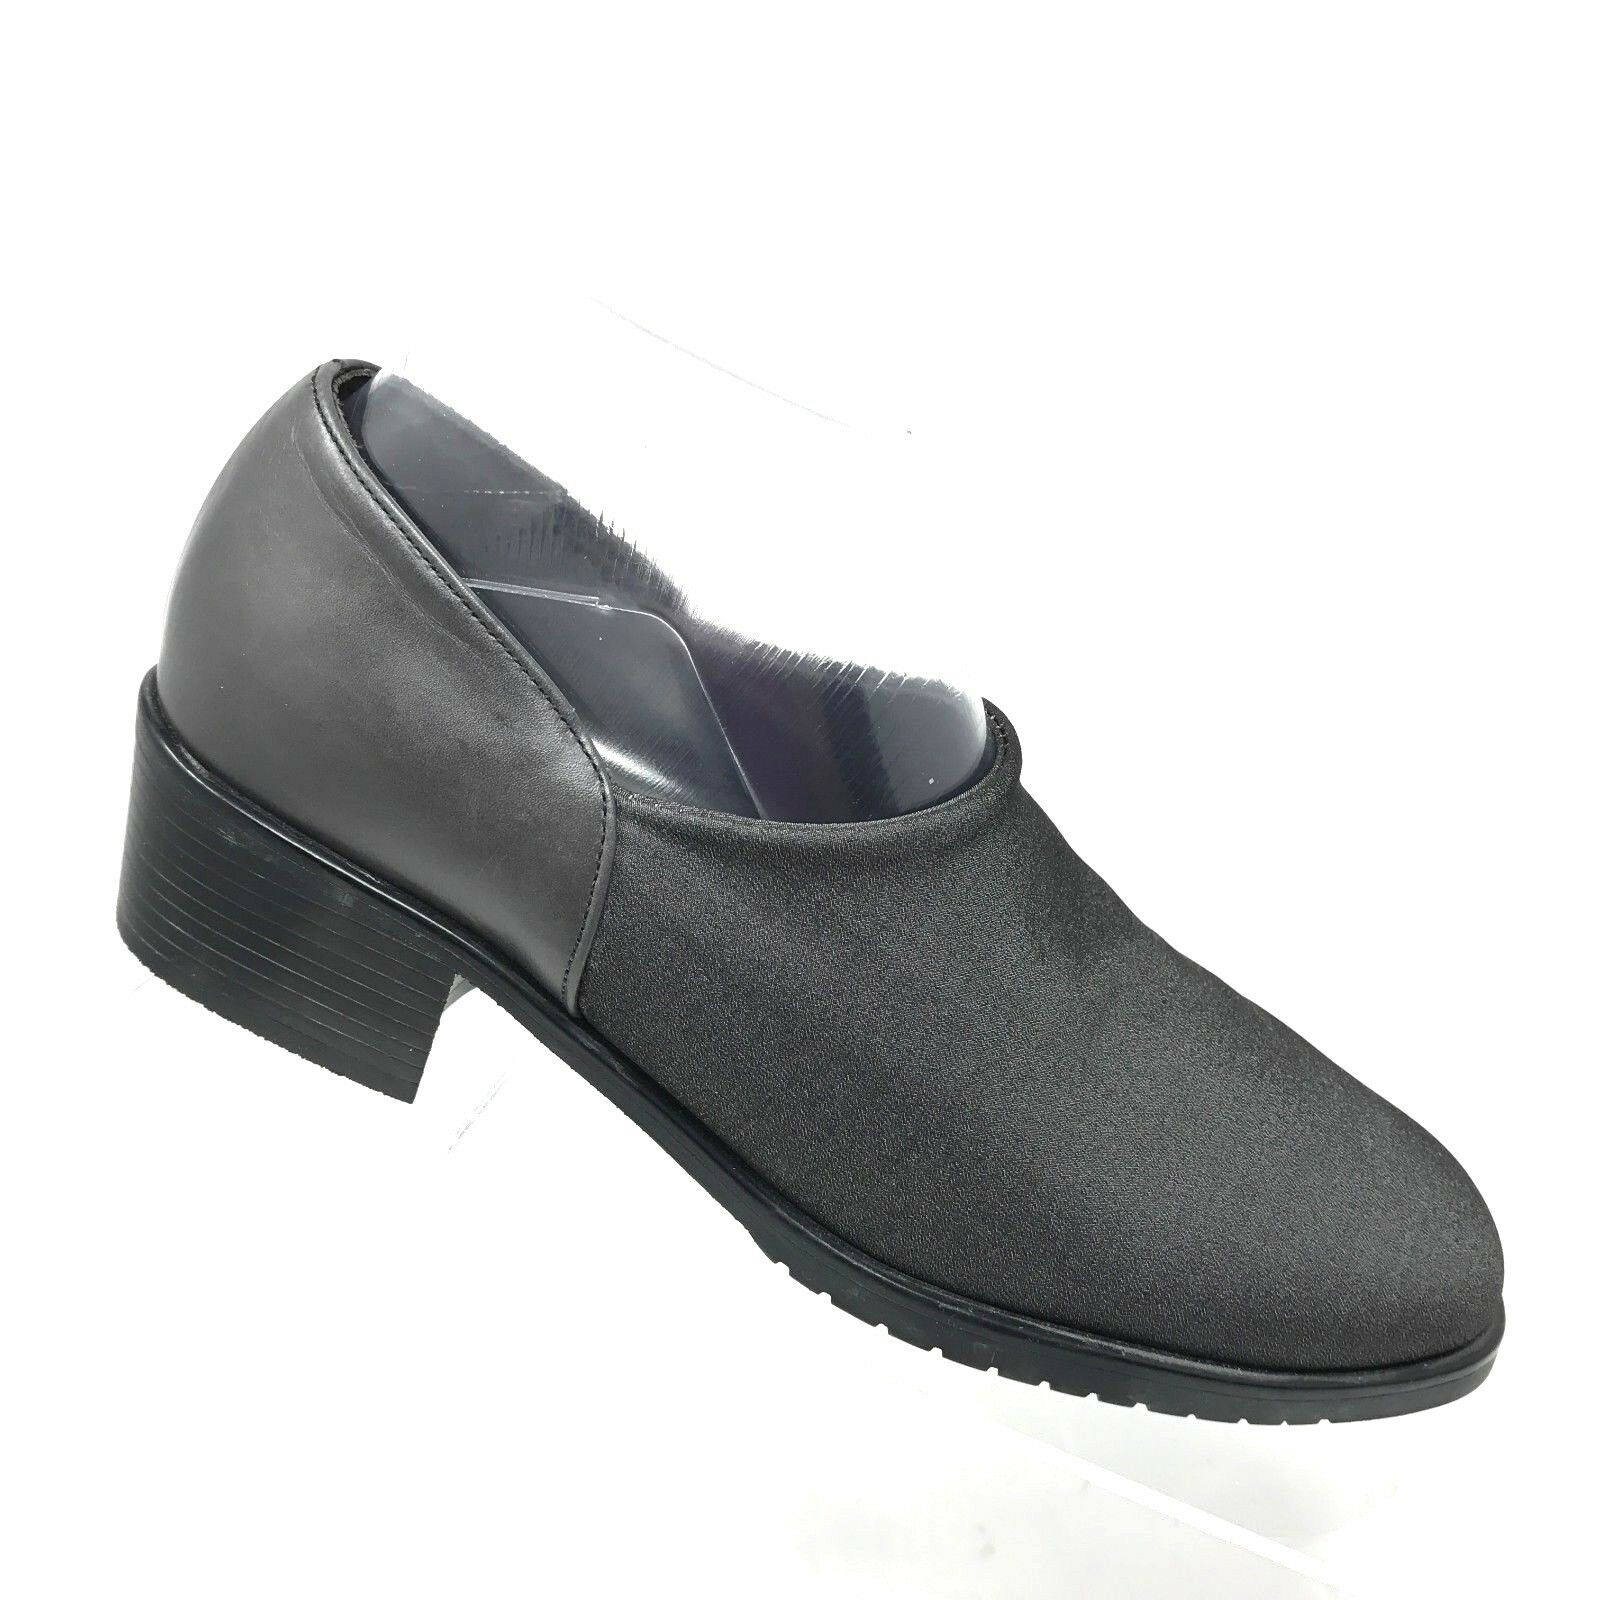 Munro STRAND II Slip On Heel Gray Stretch Fabric Leather Heel On Womens Shoe SIZE 8 M 492581